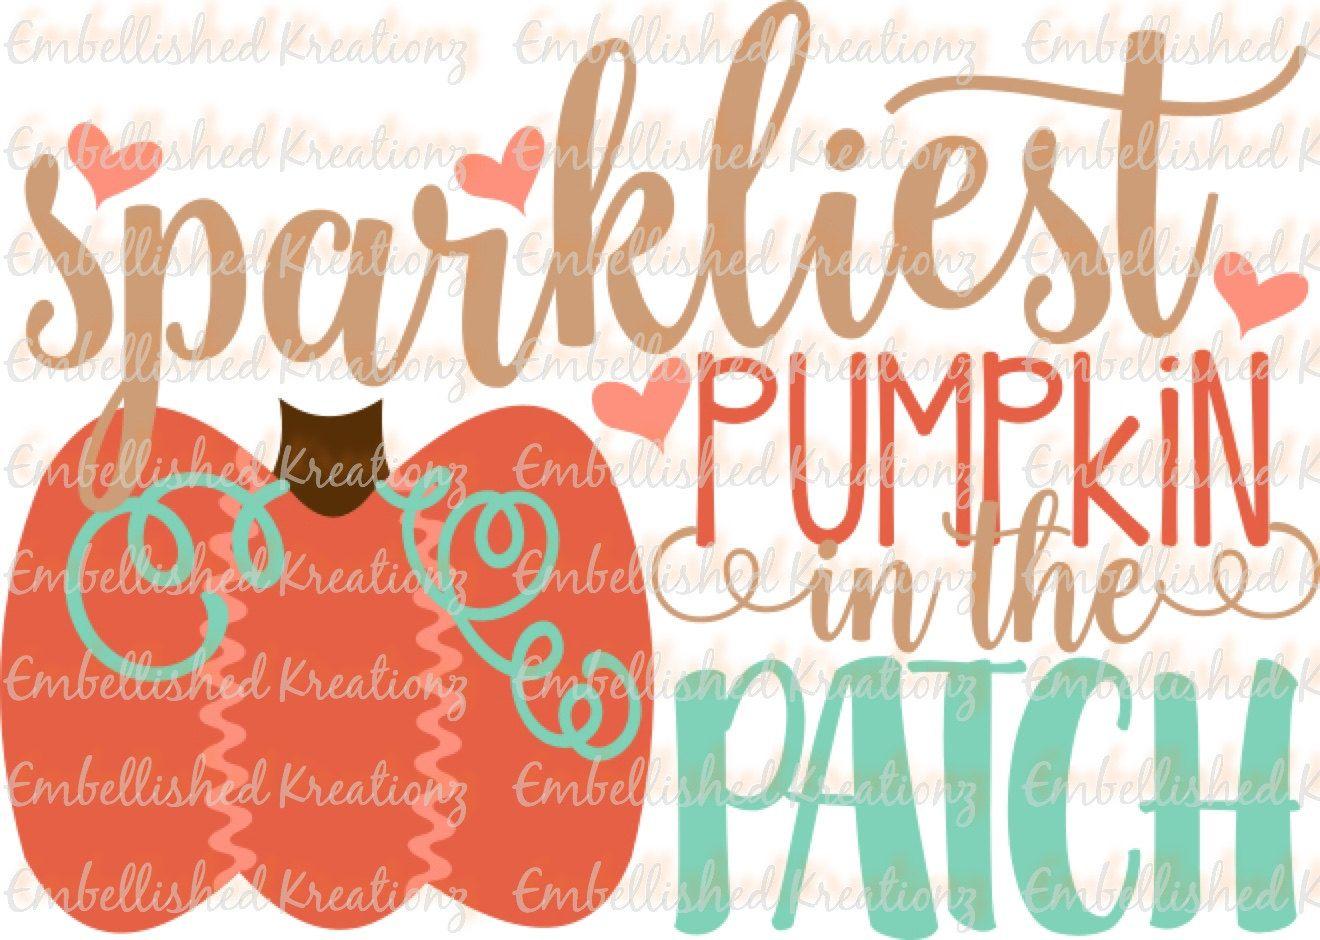 FallAutumnSparkliest Pumpkin In The Patch With PumpkinHearts - Halloween vinyl decals for glass blocks